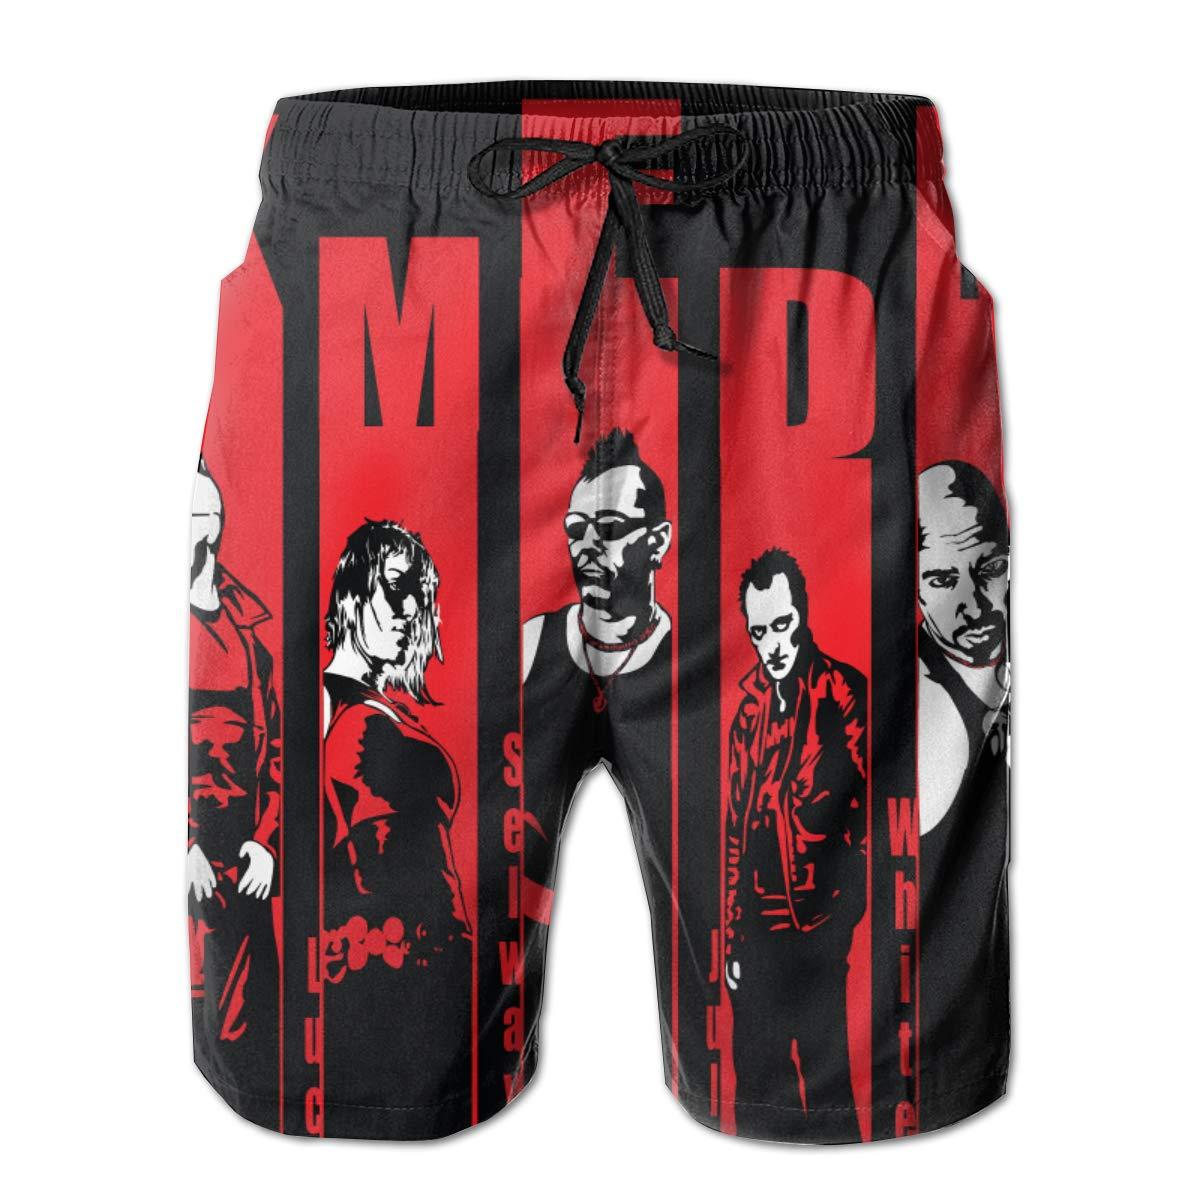 WangSiwe KMFDM Music Band 3D Printed Beach Trunks Board Shorts Casual Summer Swimwear Pants